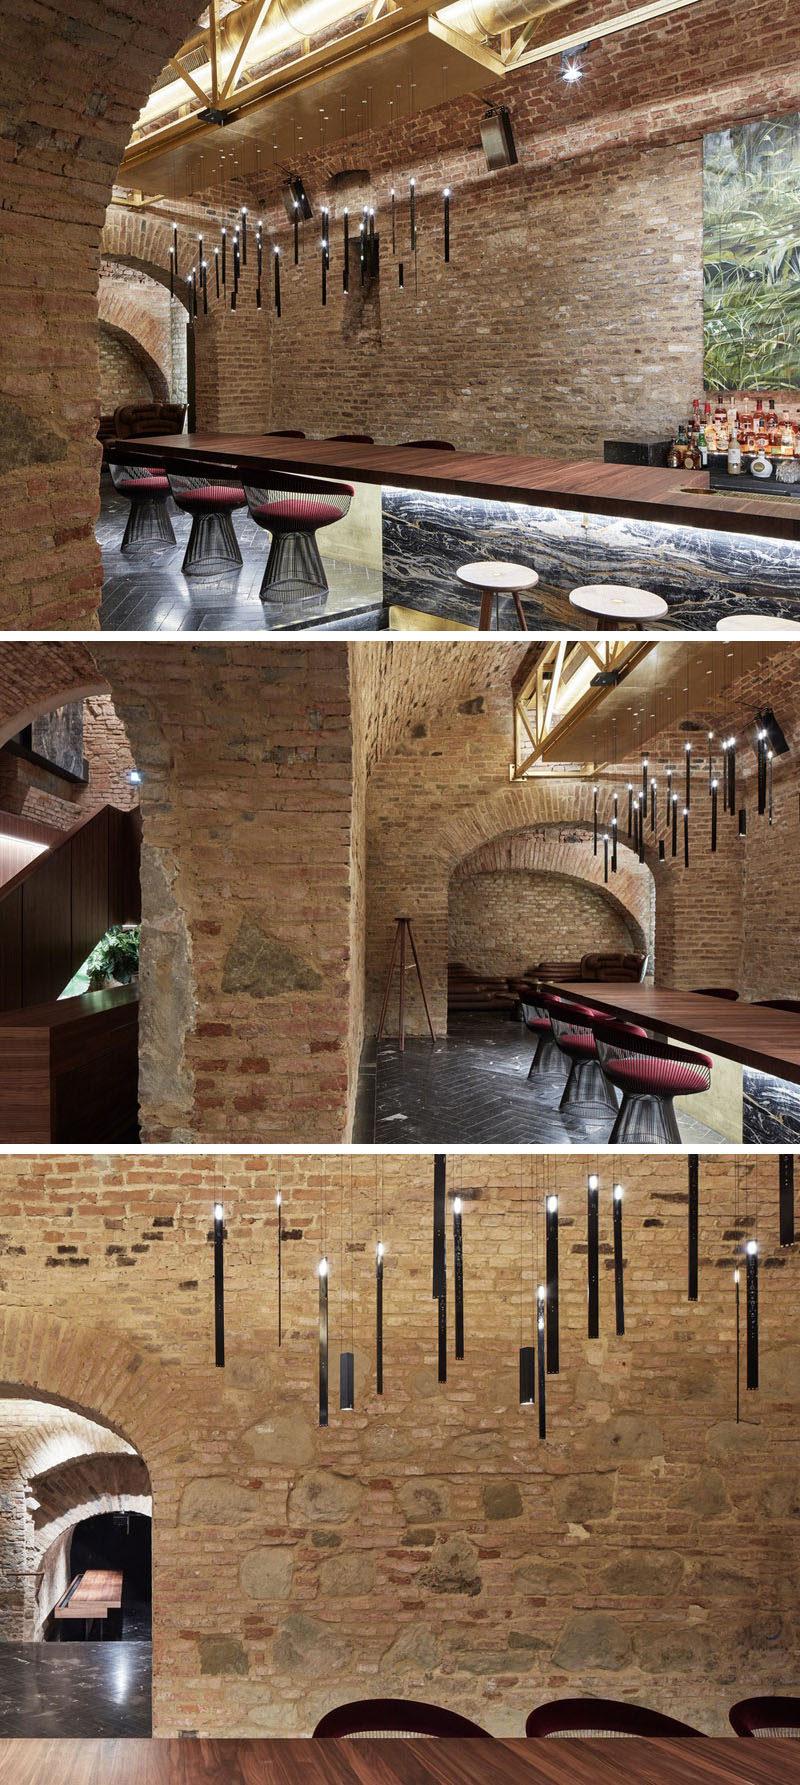 Büro KLK transformed an 18th century cellar in Vienna, Austria, into a contemporary underground cocktail bar. #CocktailBar #UndergroundBar